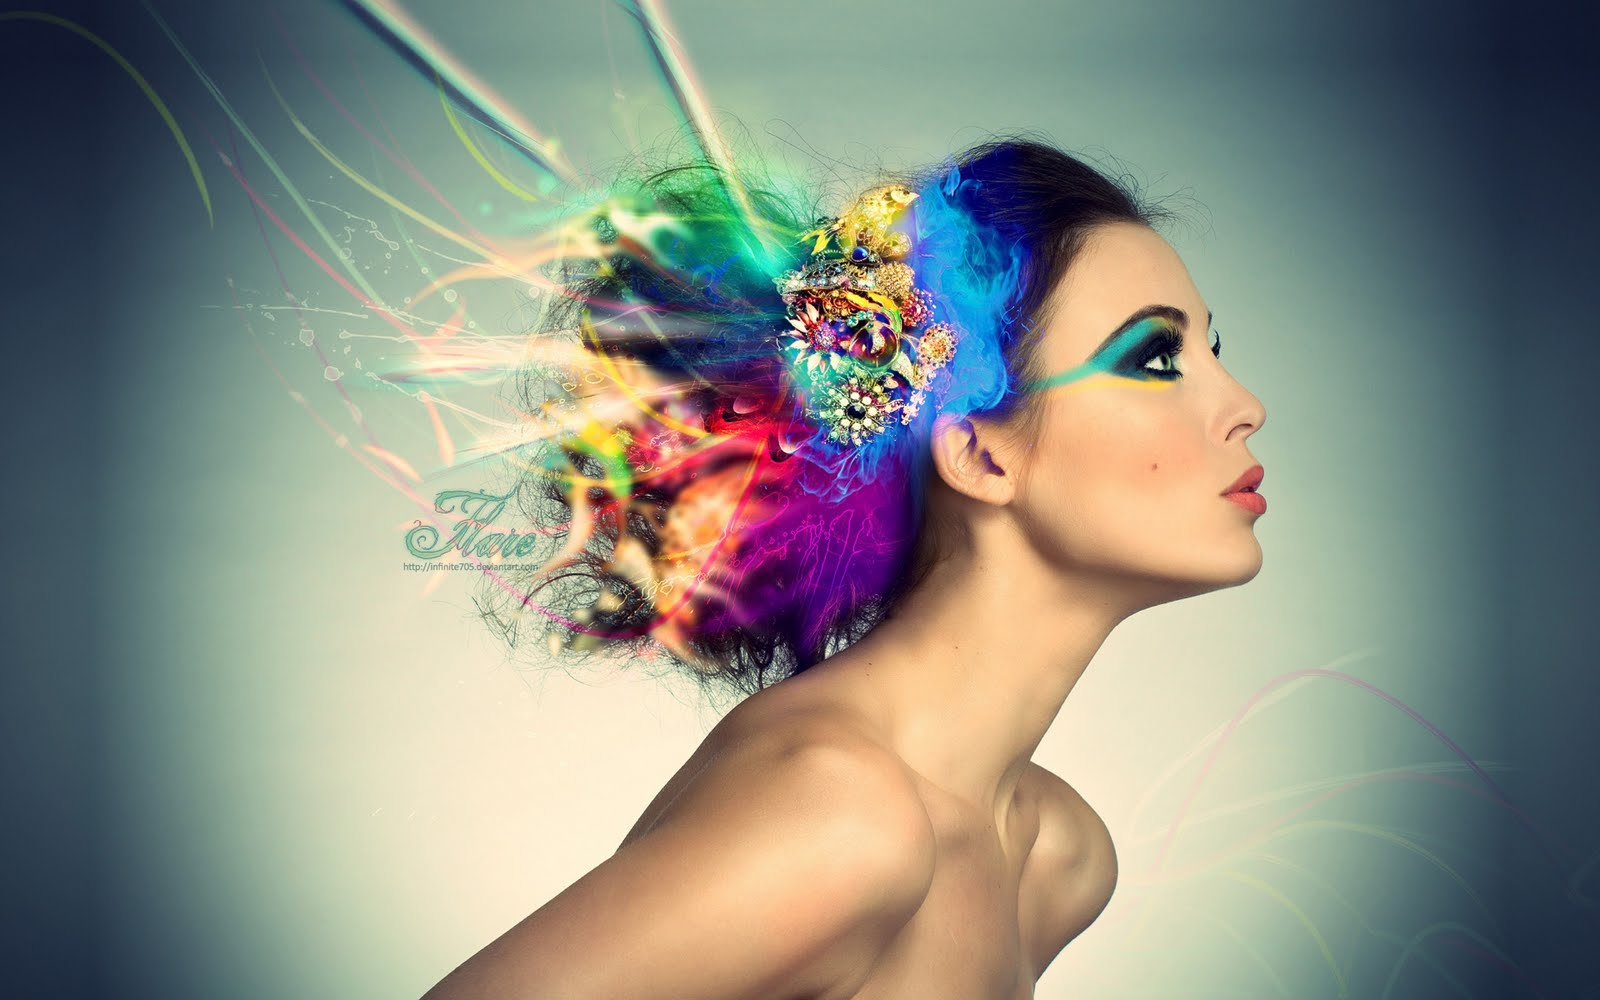 http://1.bp.blogspot.com/-3jg45Qc5d4s/TdTy8tSBHtI/AAAAAAAAAbQ/vPbv2nqWWnA/s1600/Rainbow+Hair+wallpaper.jpeg